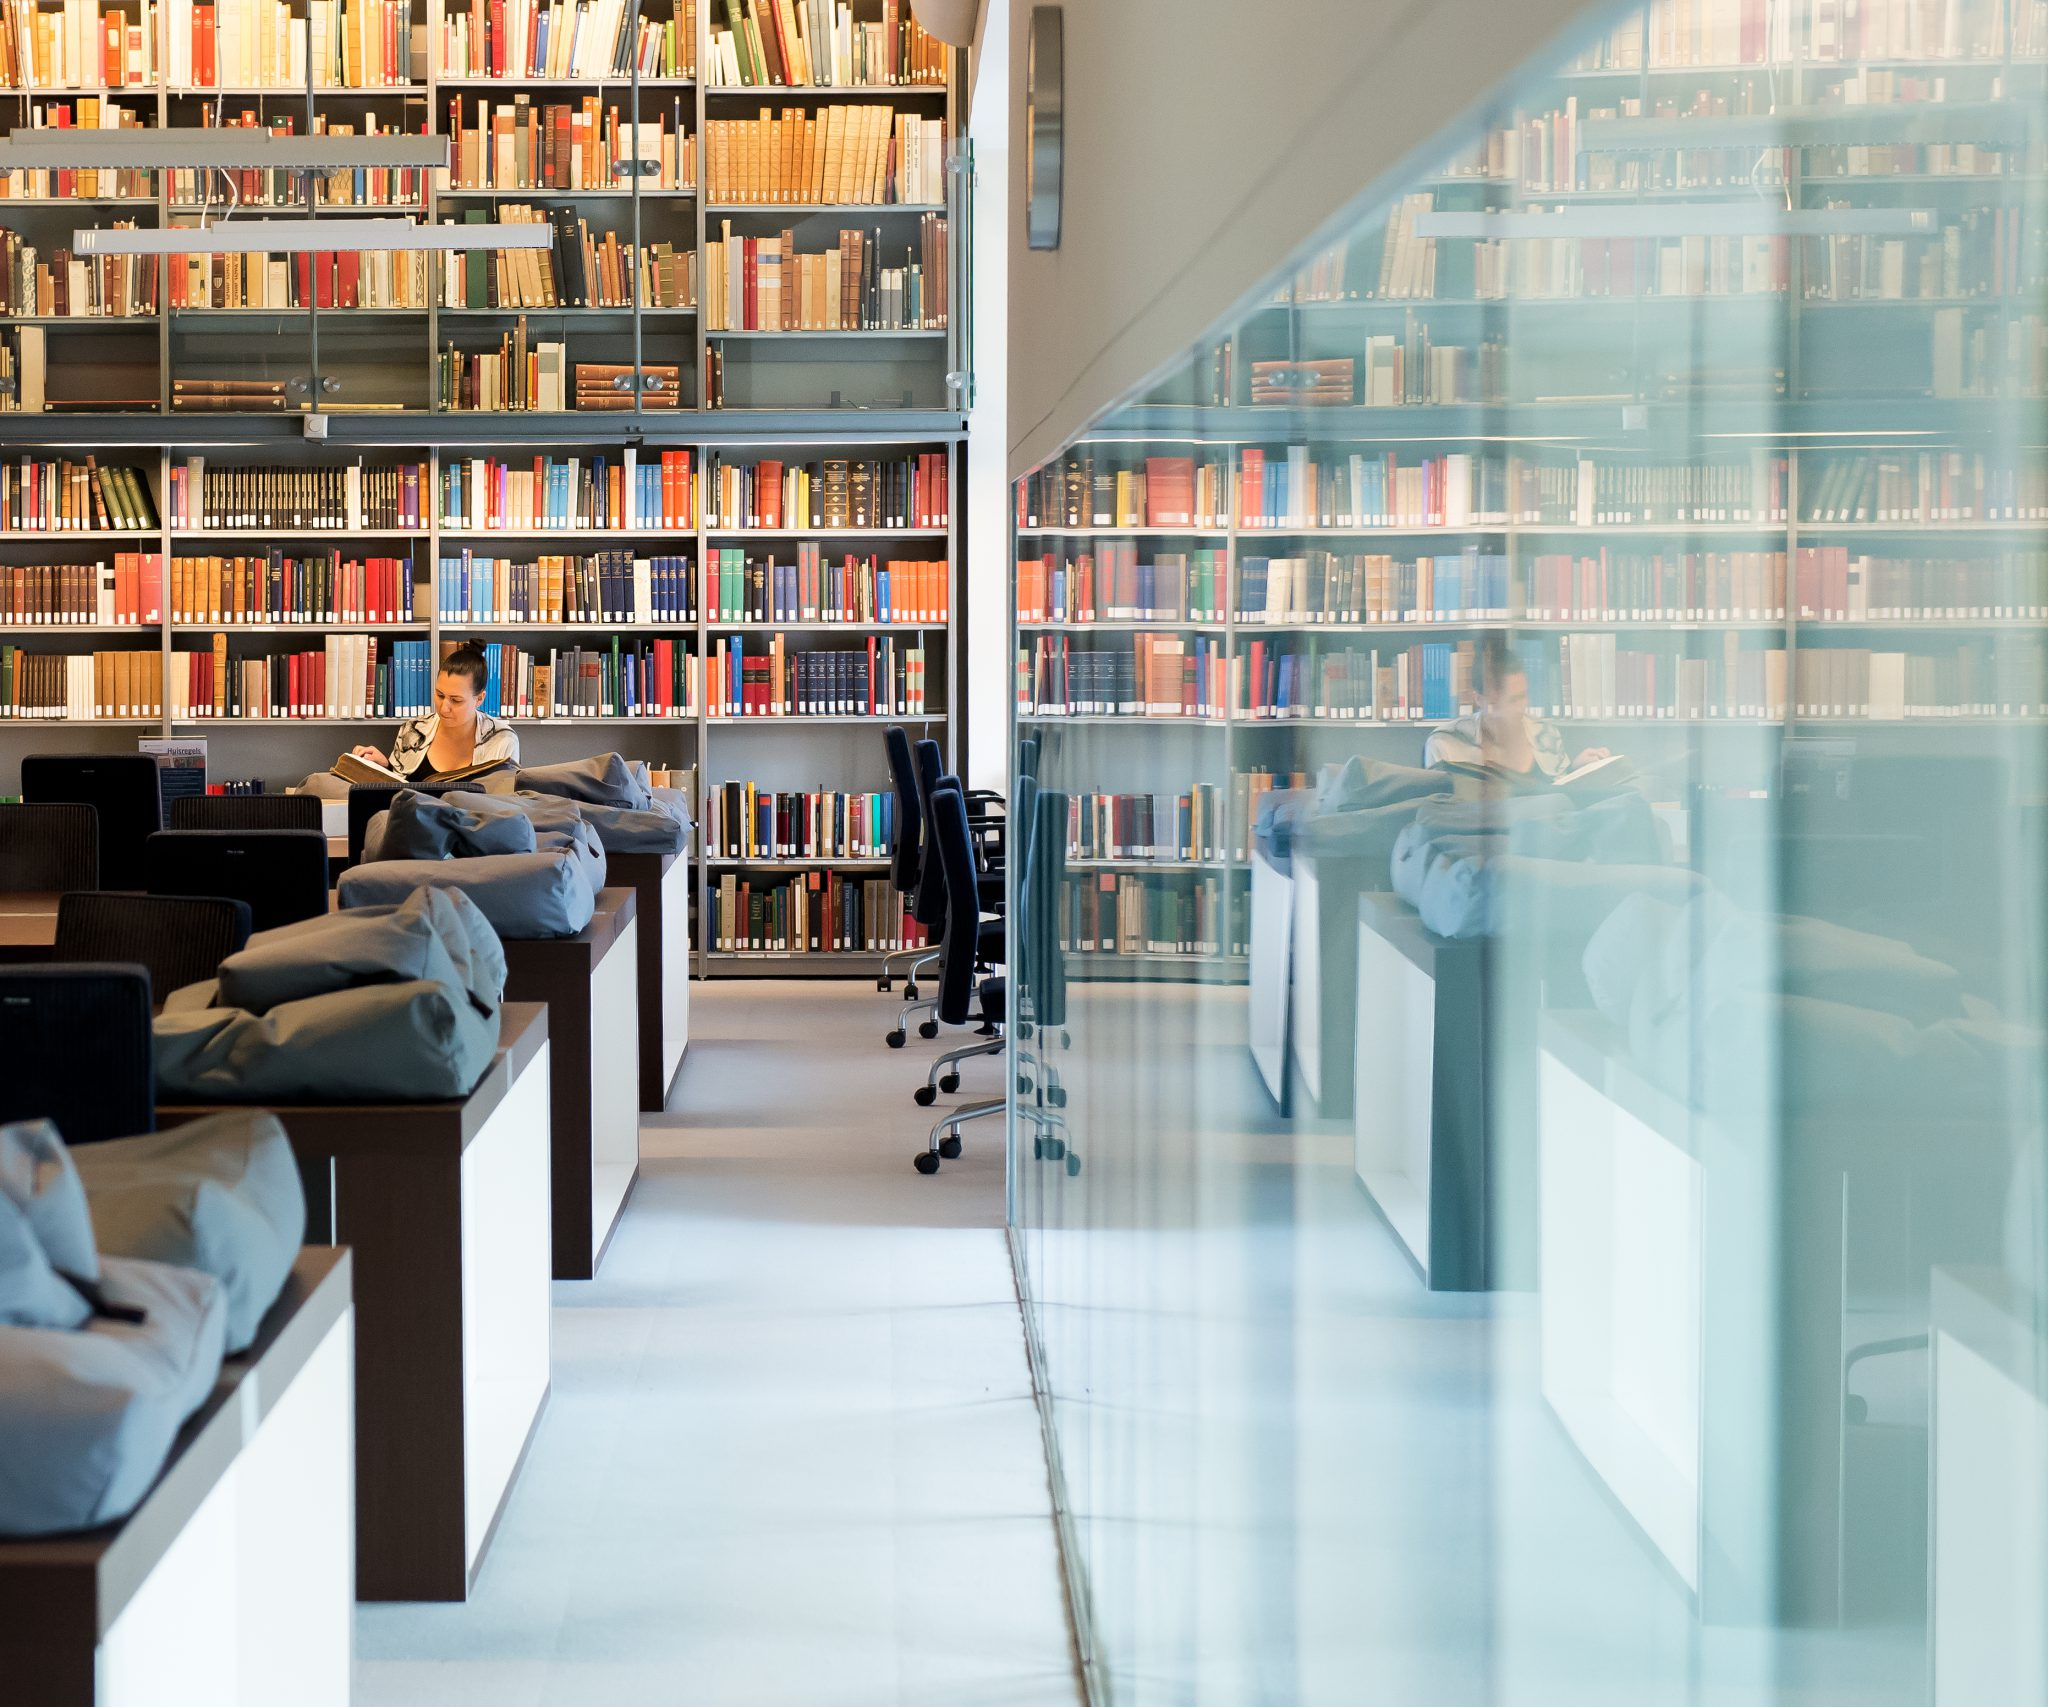 (C) Universiteit van Amsterdam